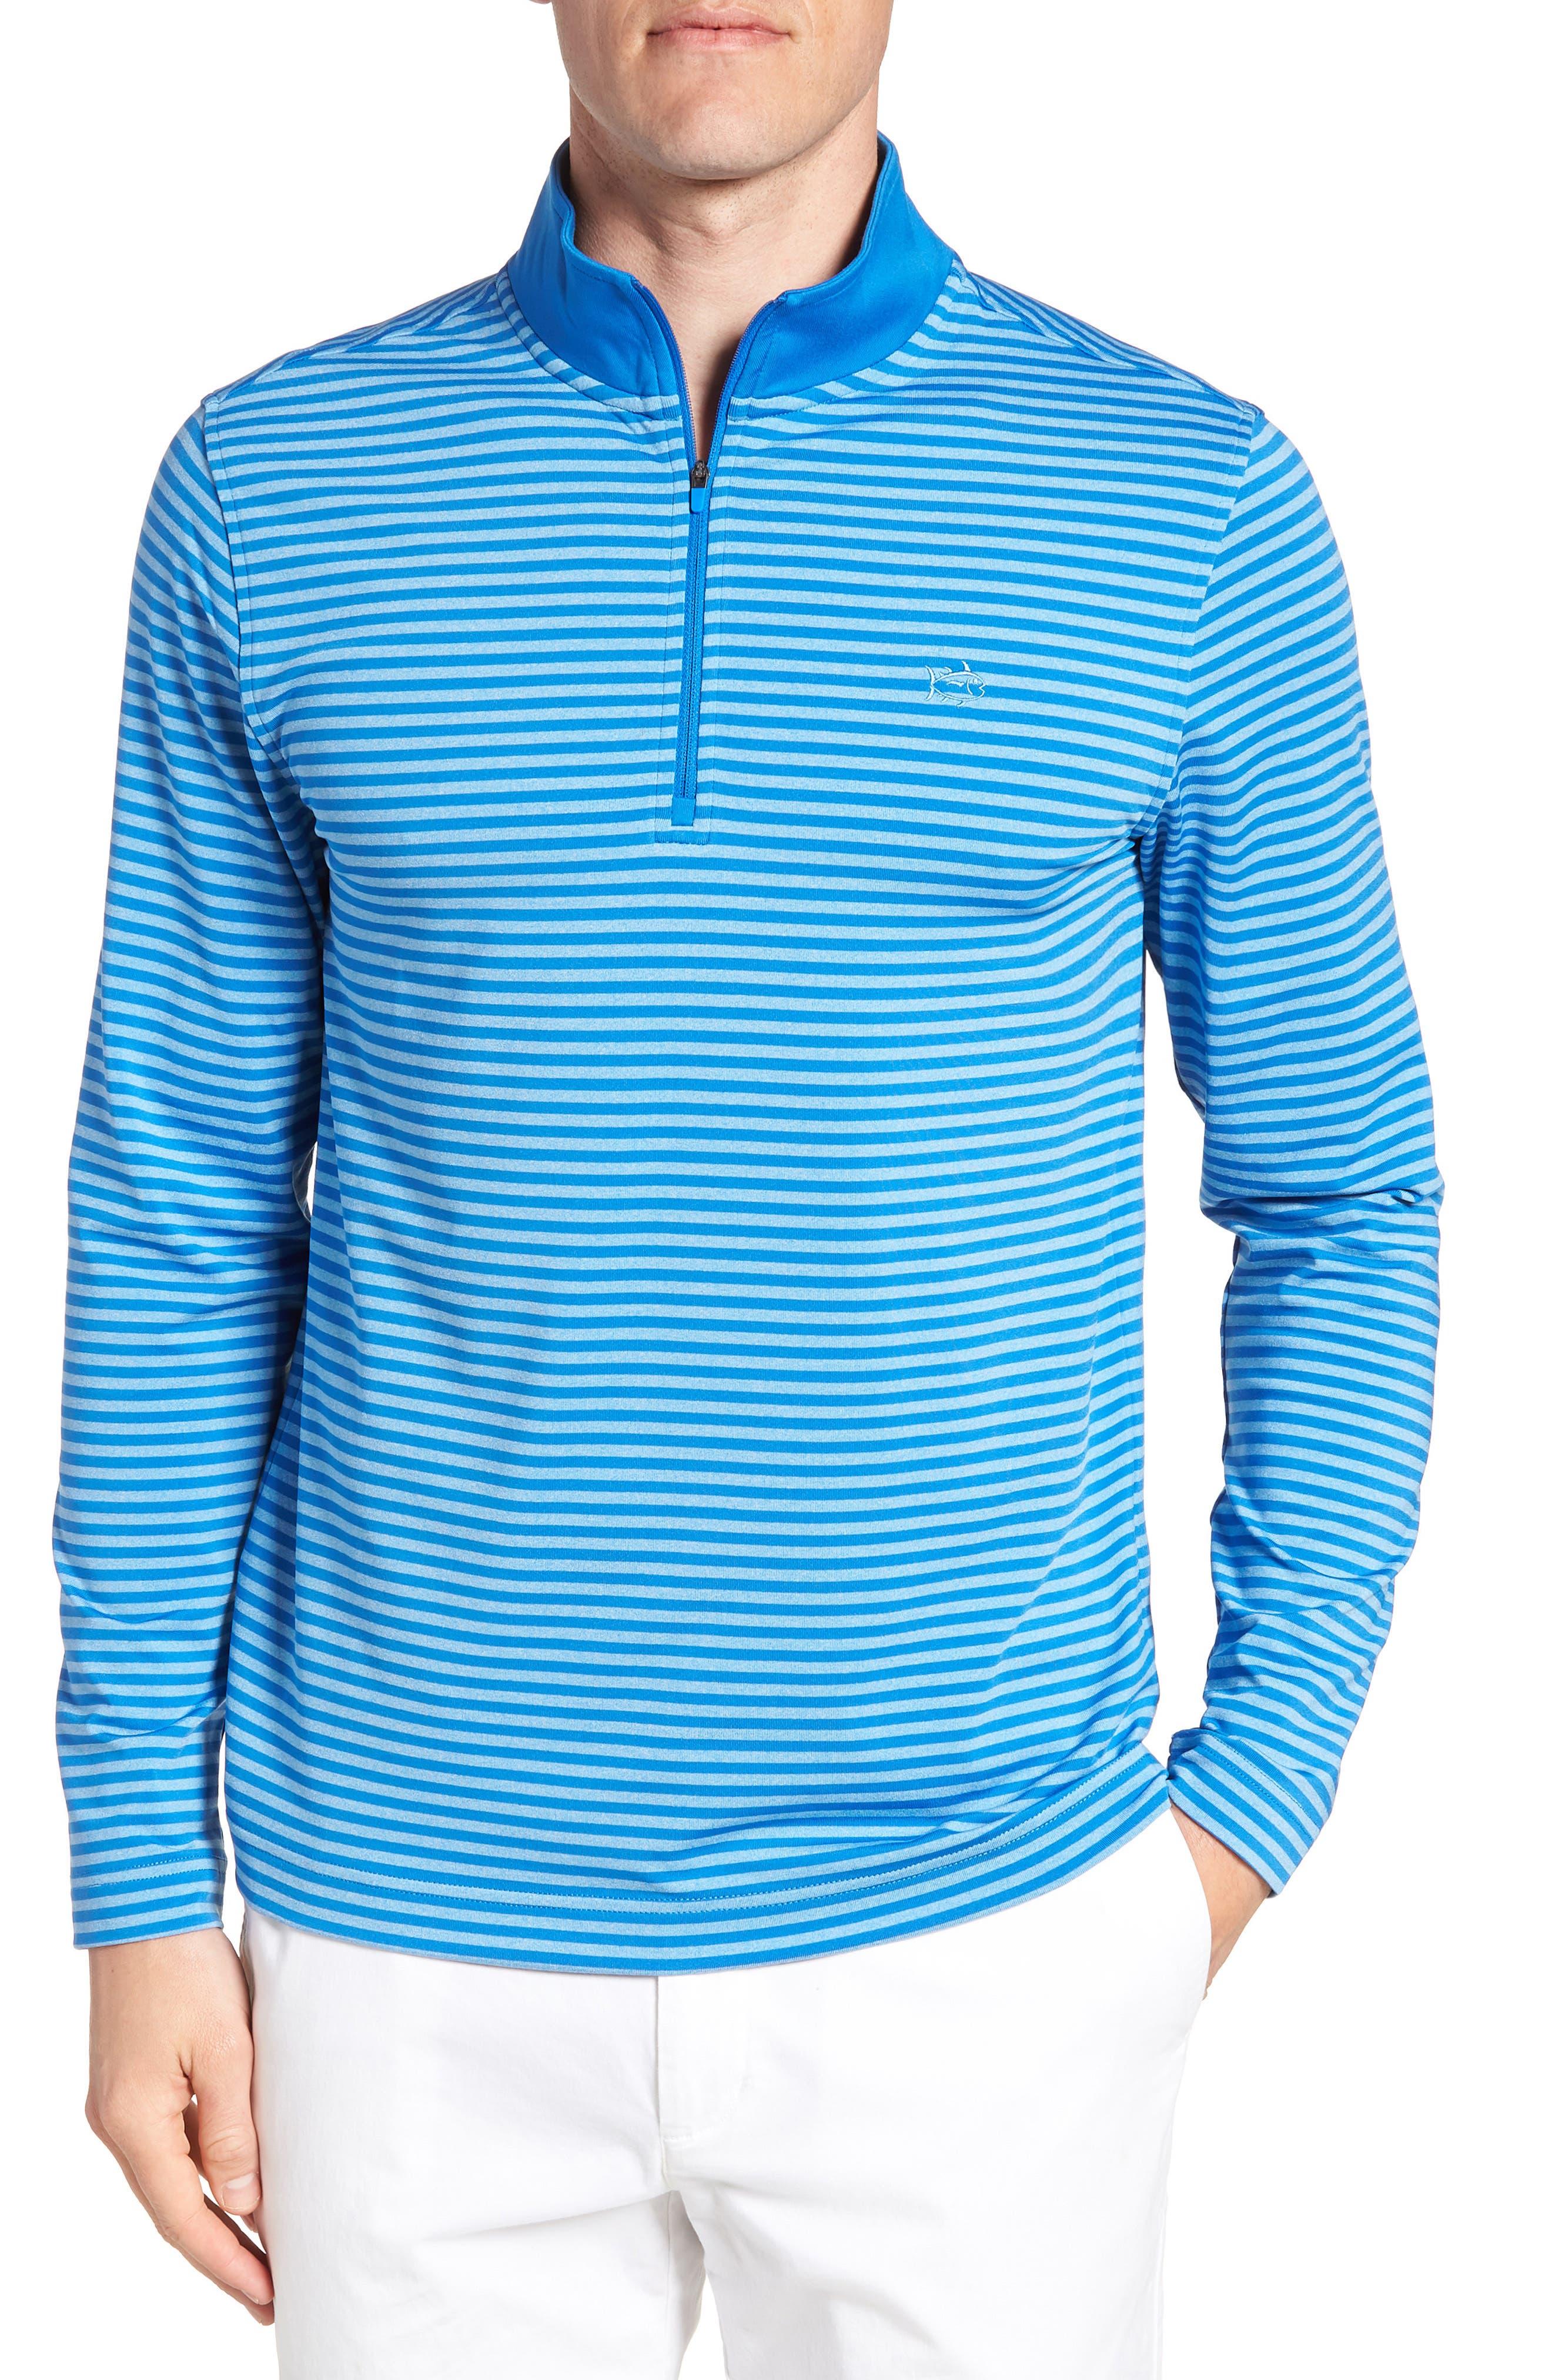 SOUTHERN TIDE Stripe Quarter Zip Pullover, Main, color, 400